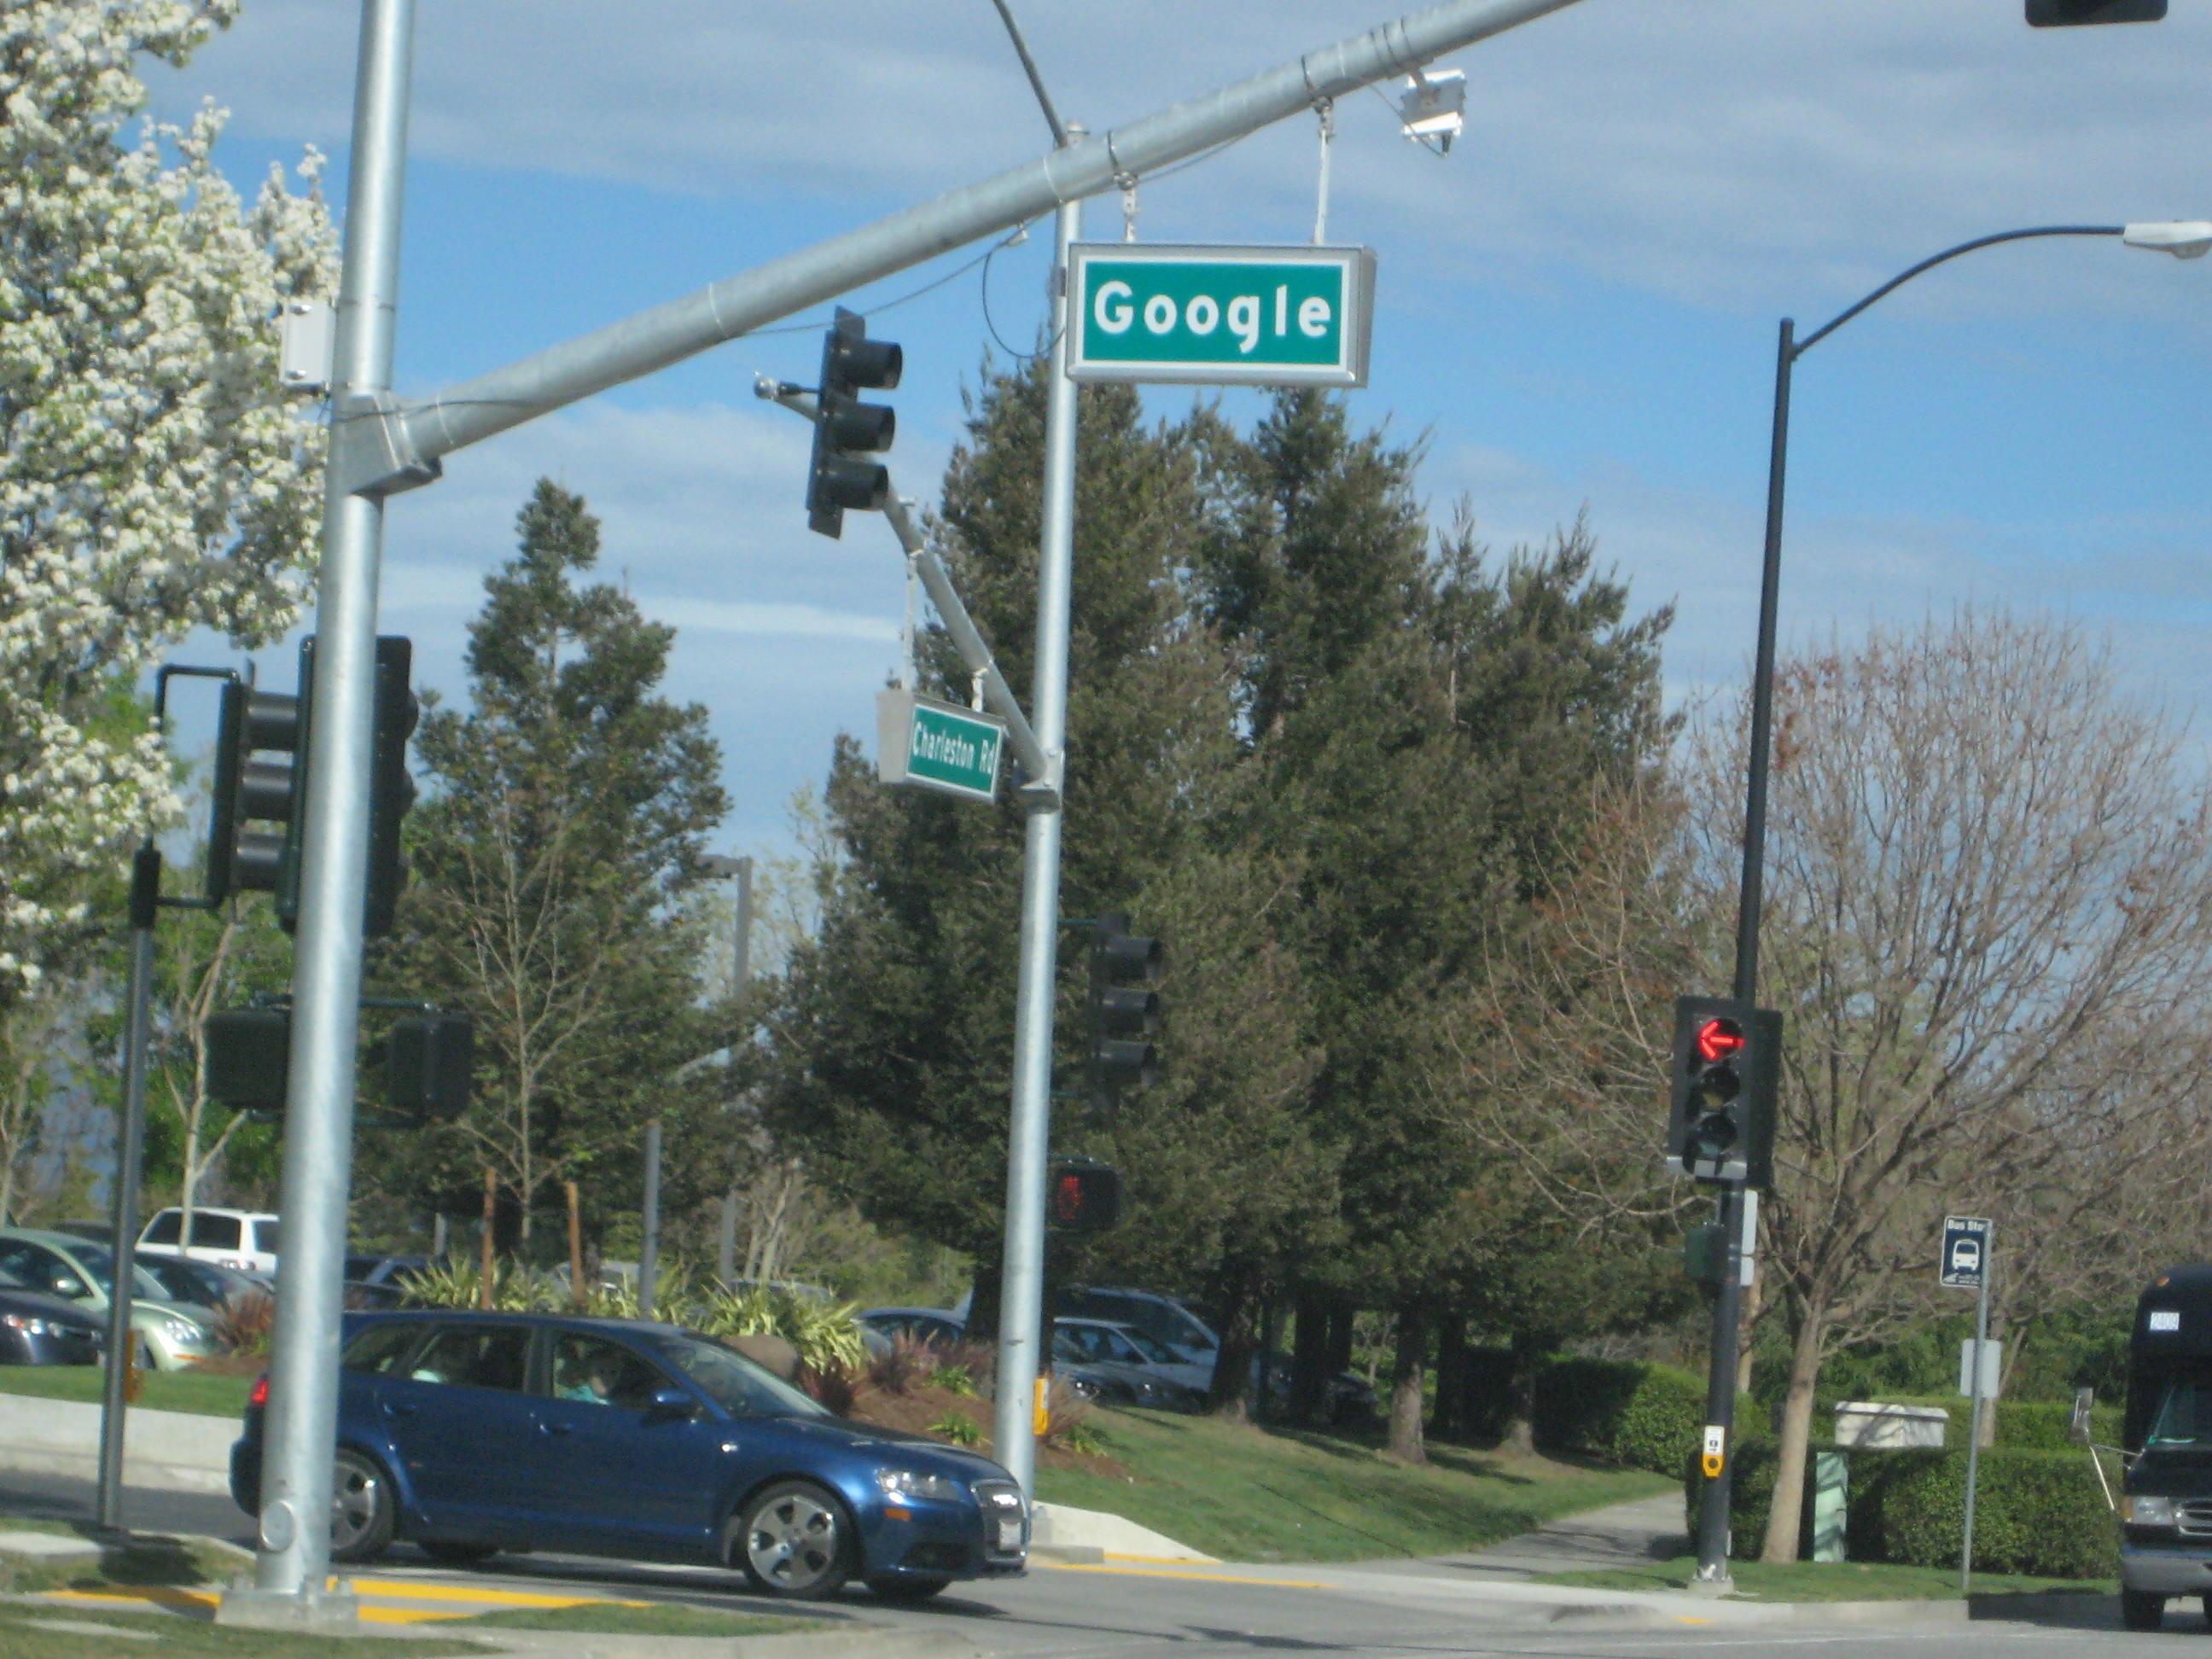 Google Street Sign